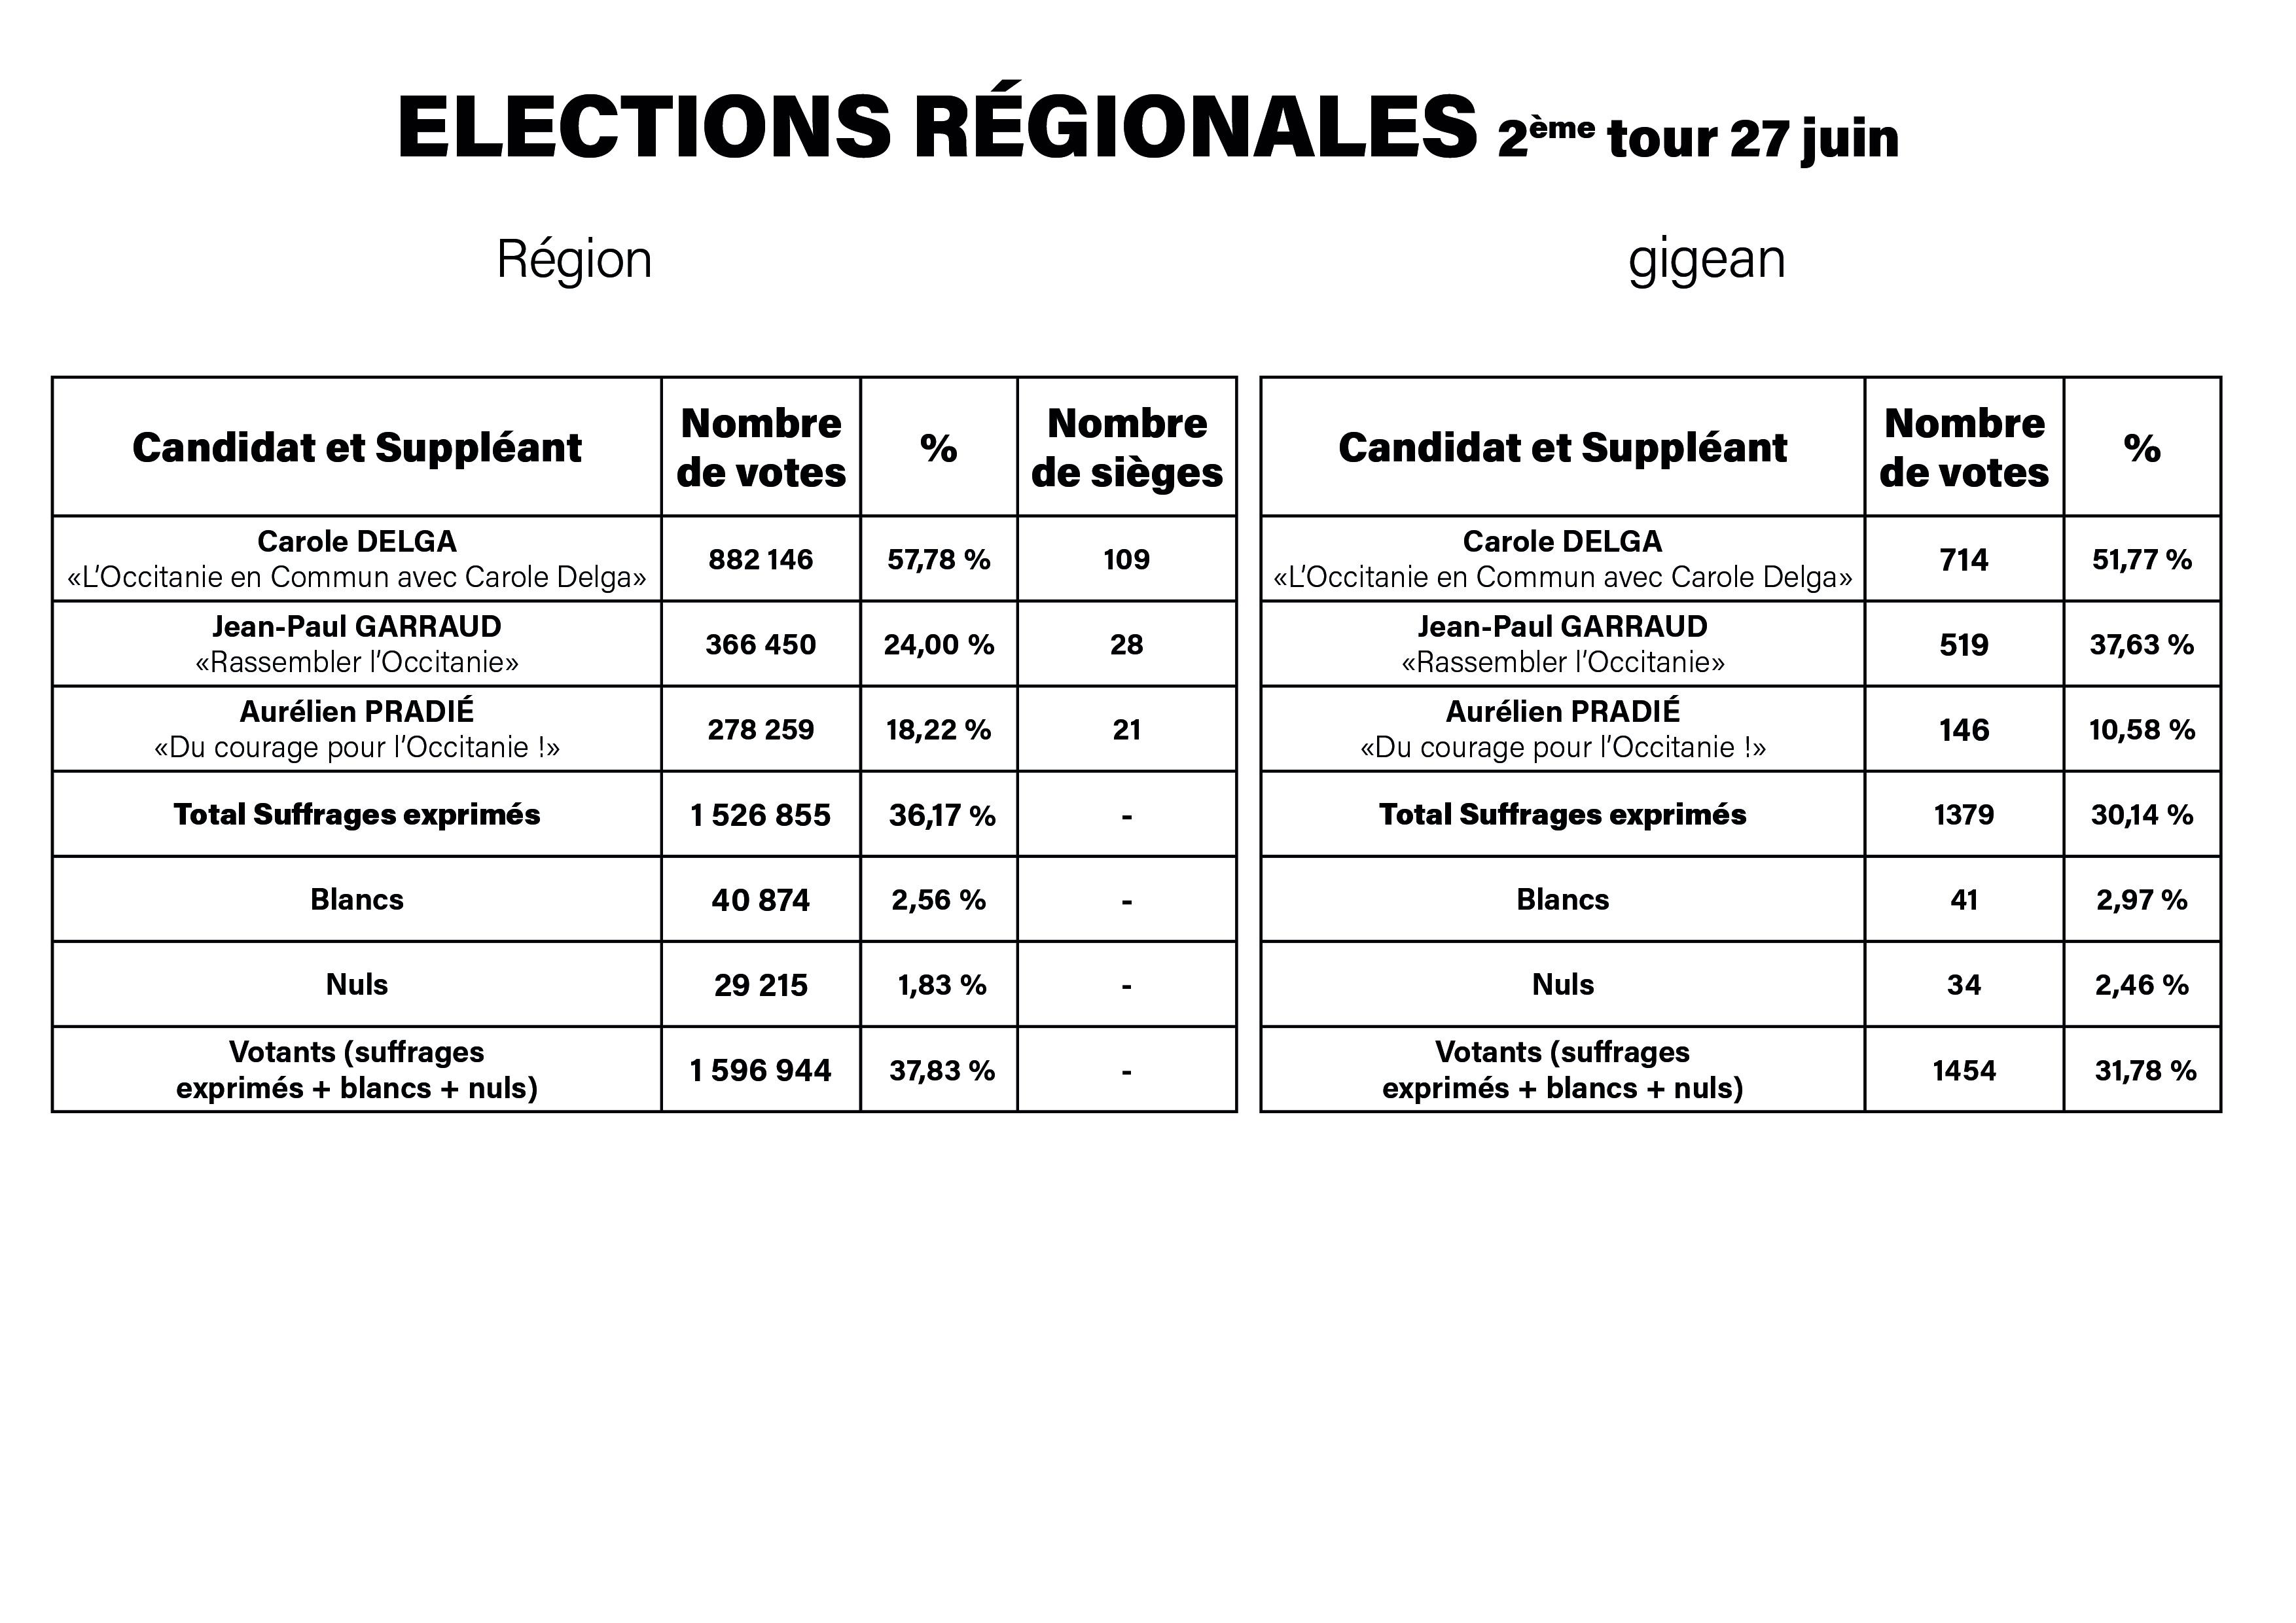 2_tour_Elections_regionales.jpg